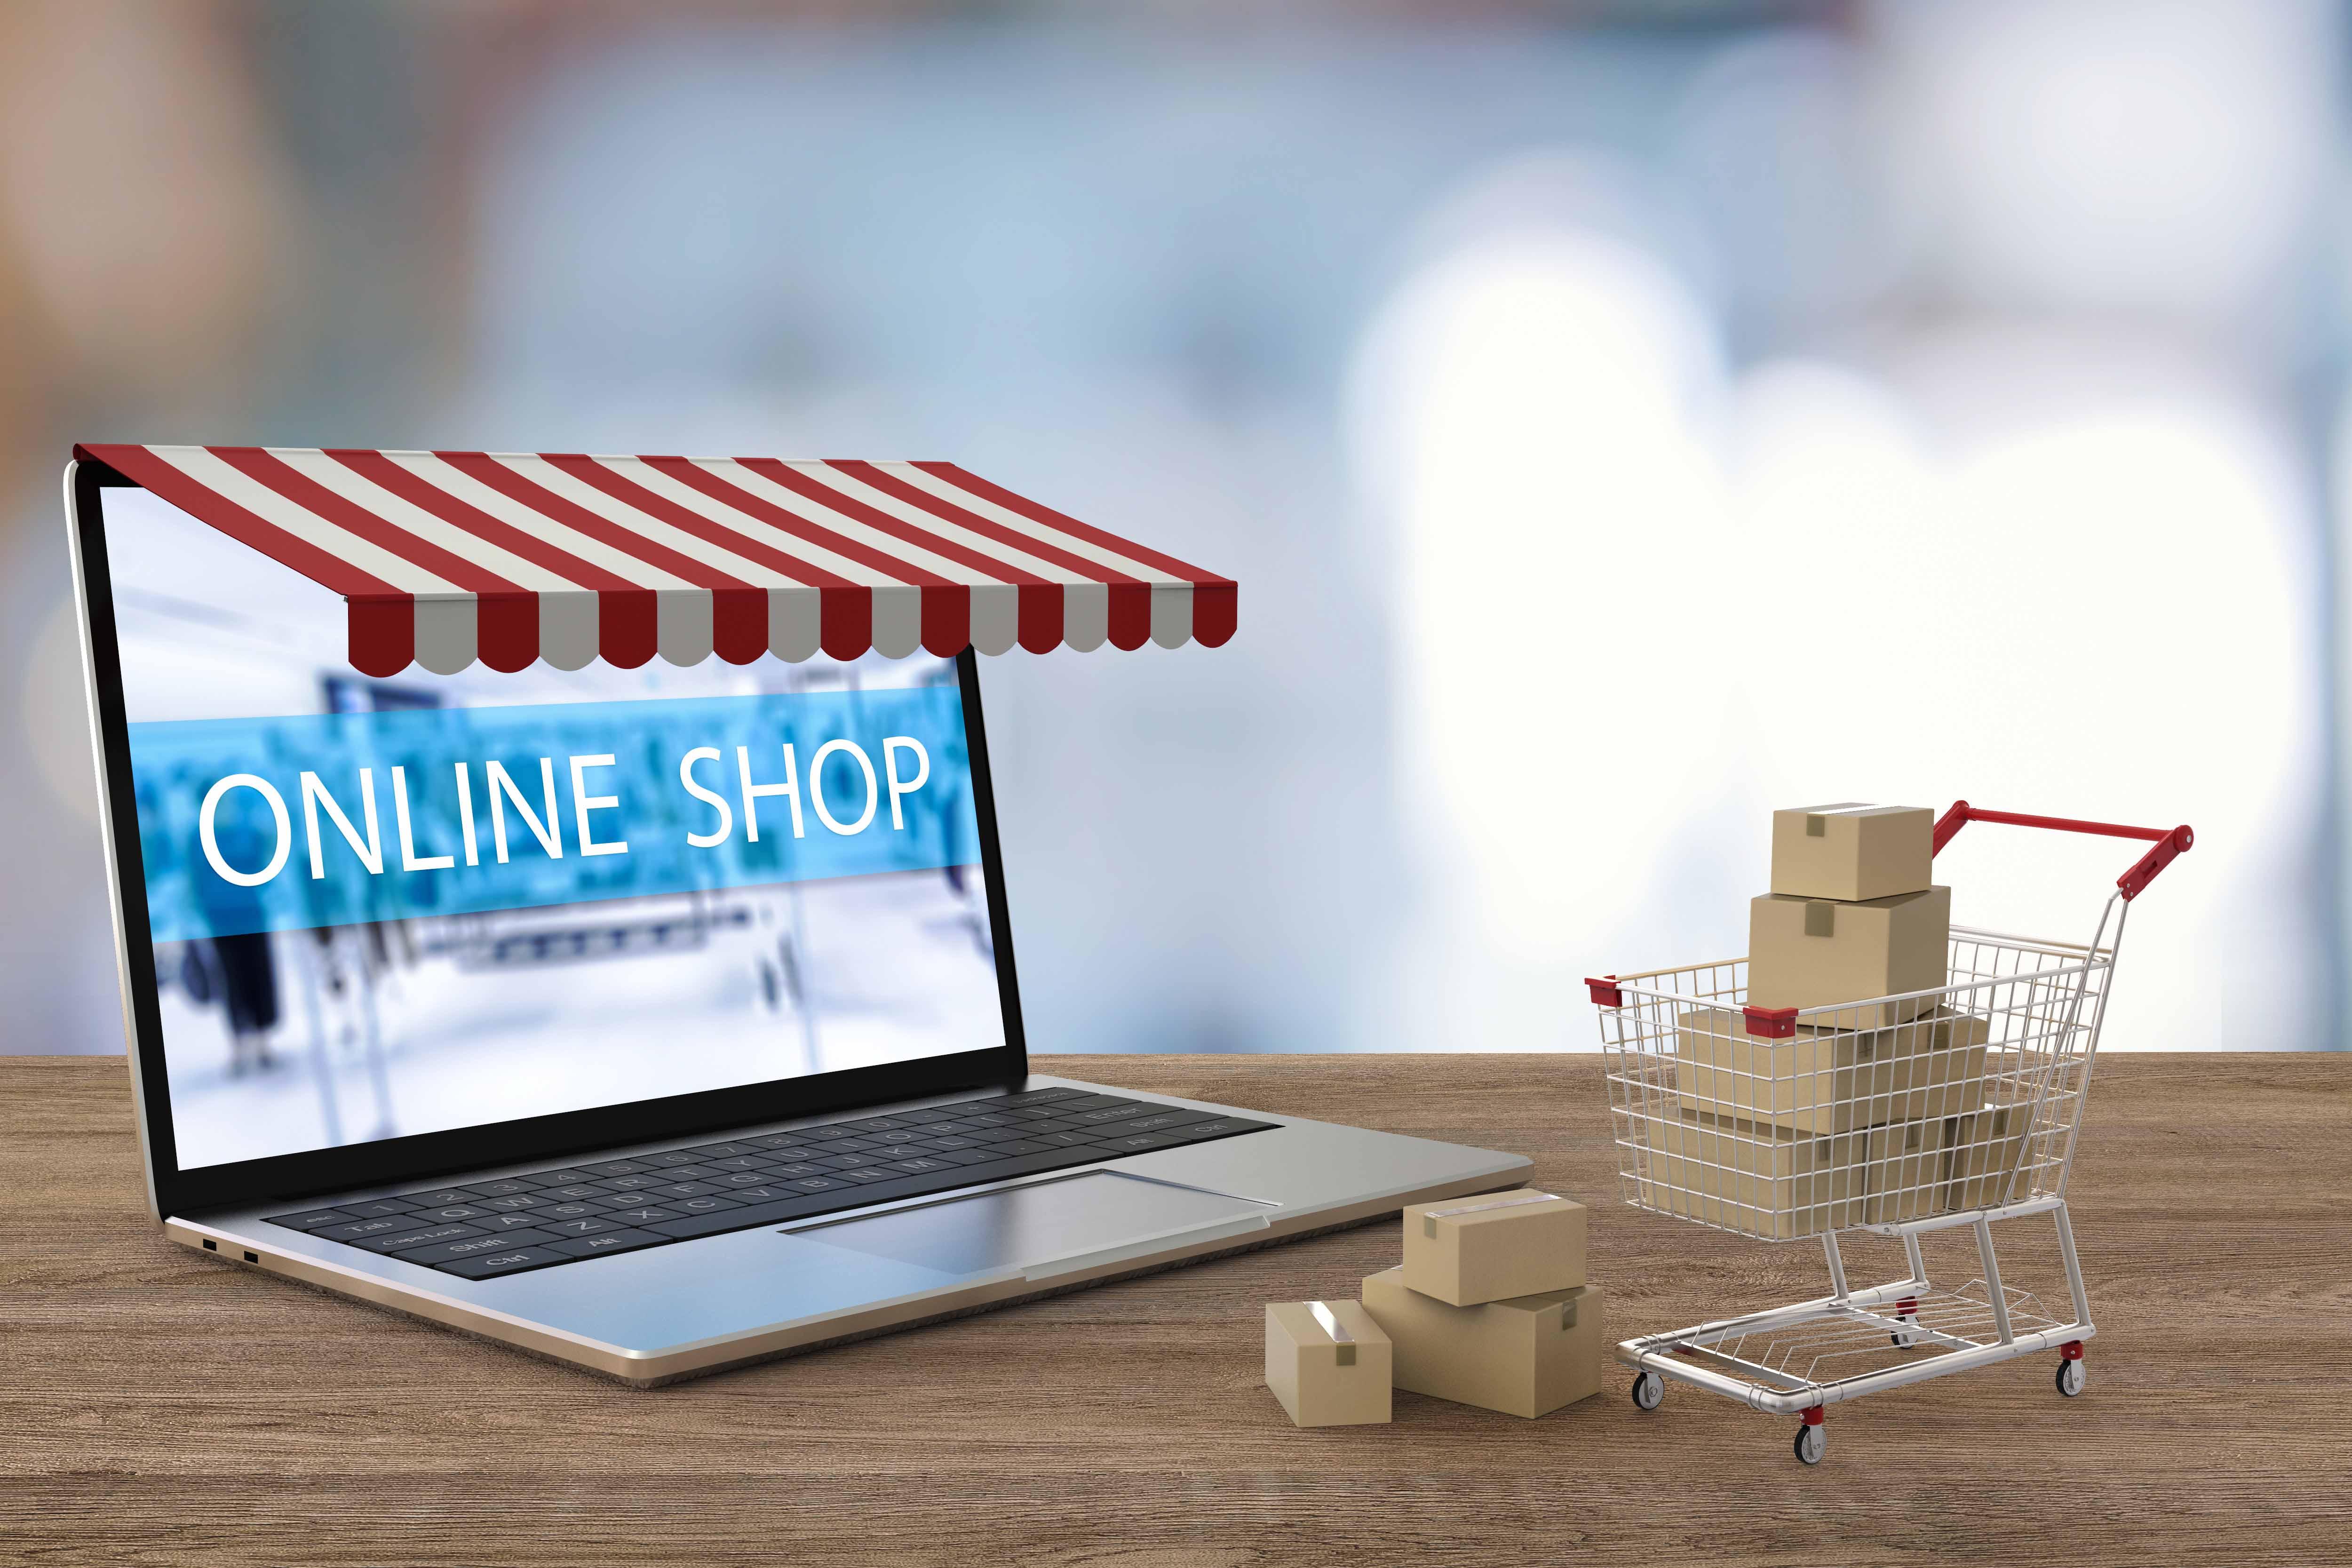 Curso Crea tu tienda on-line con prestashop (ADGD055PO)